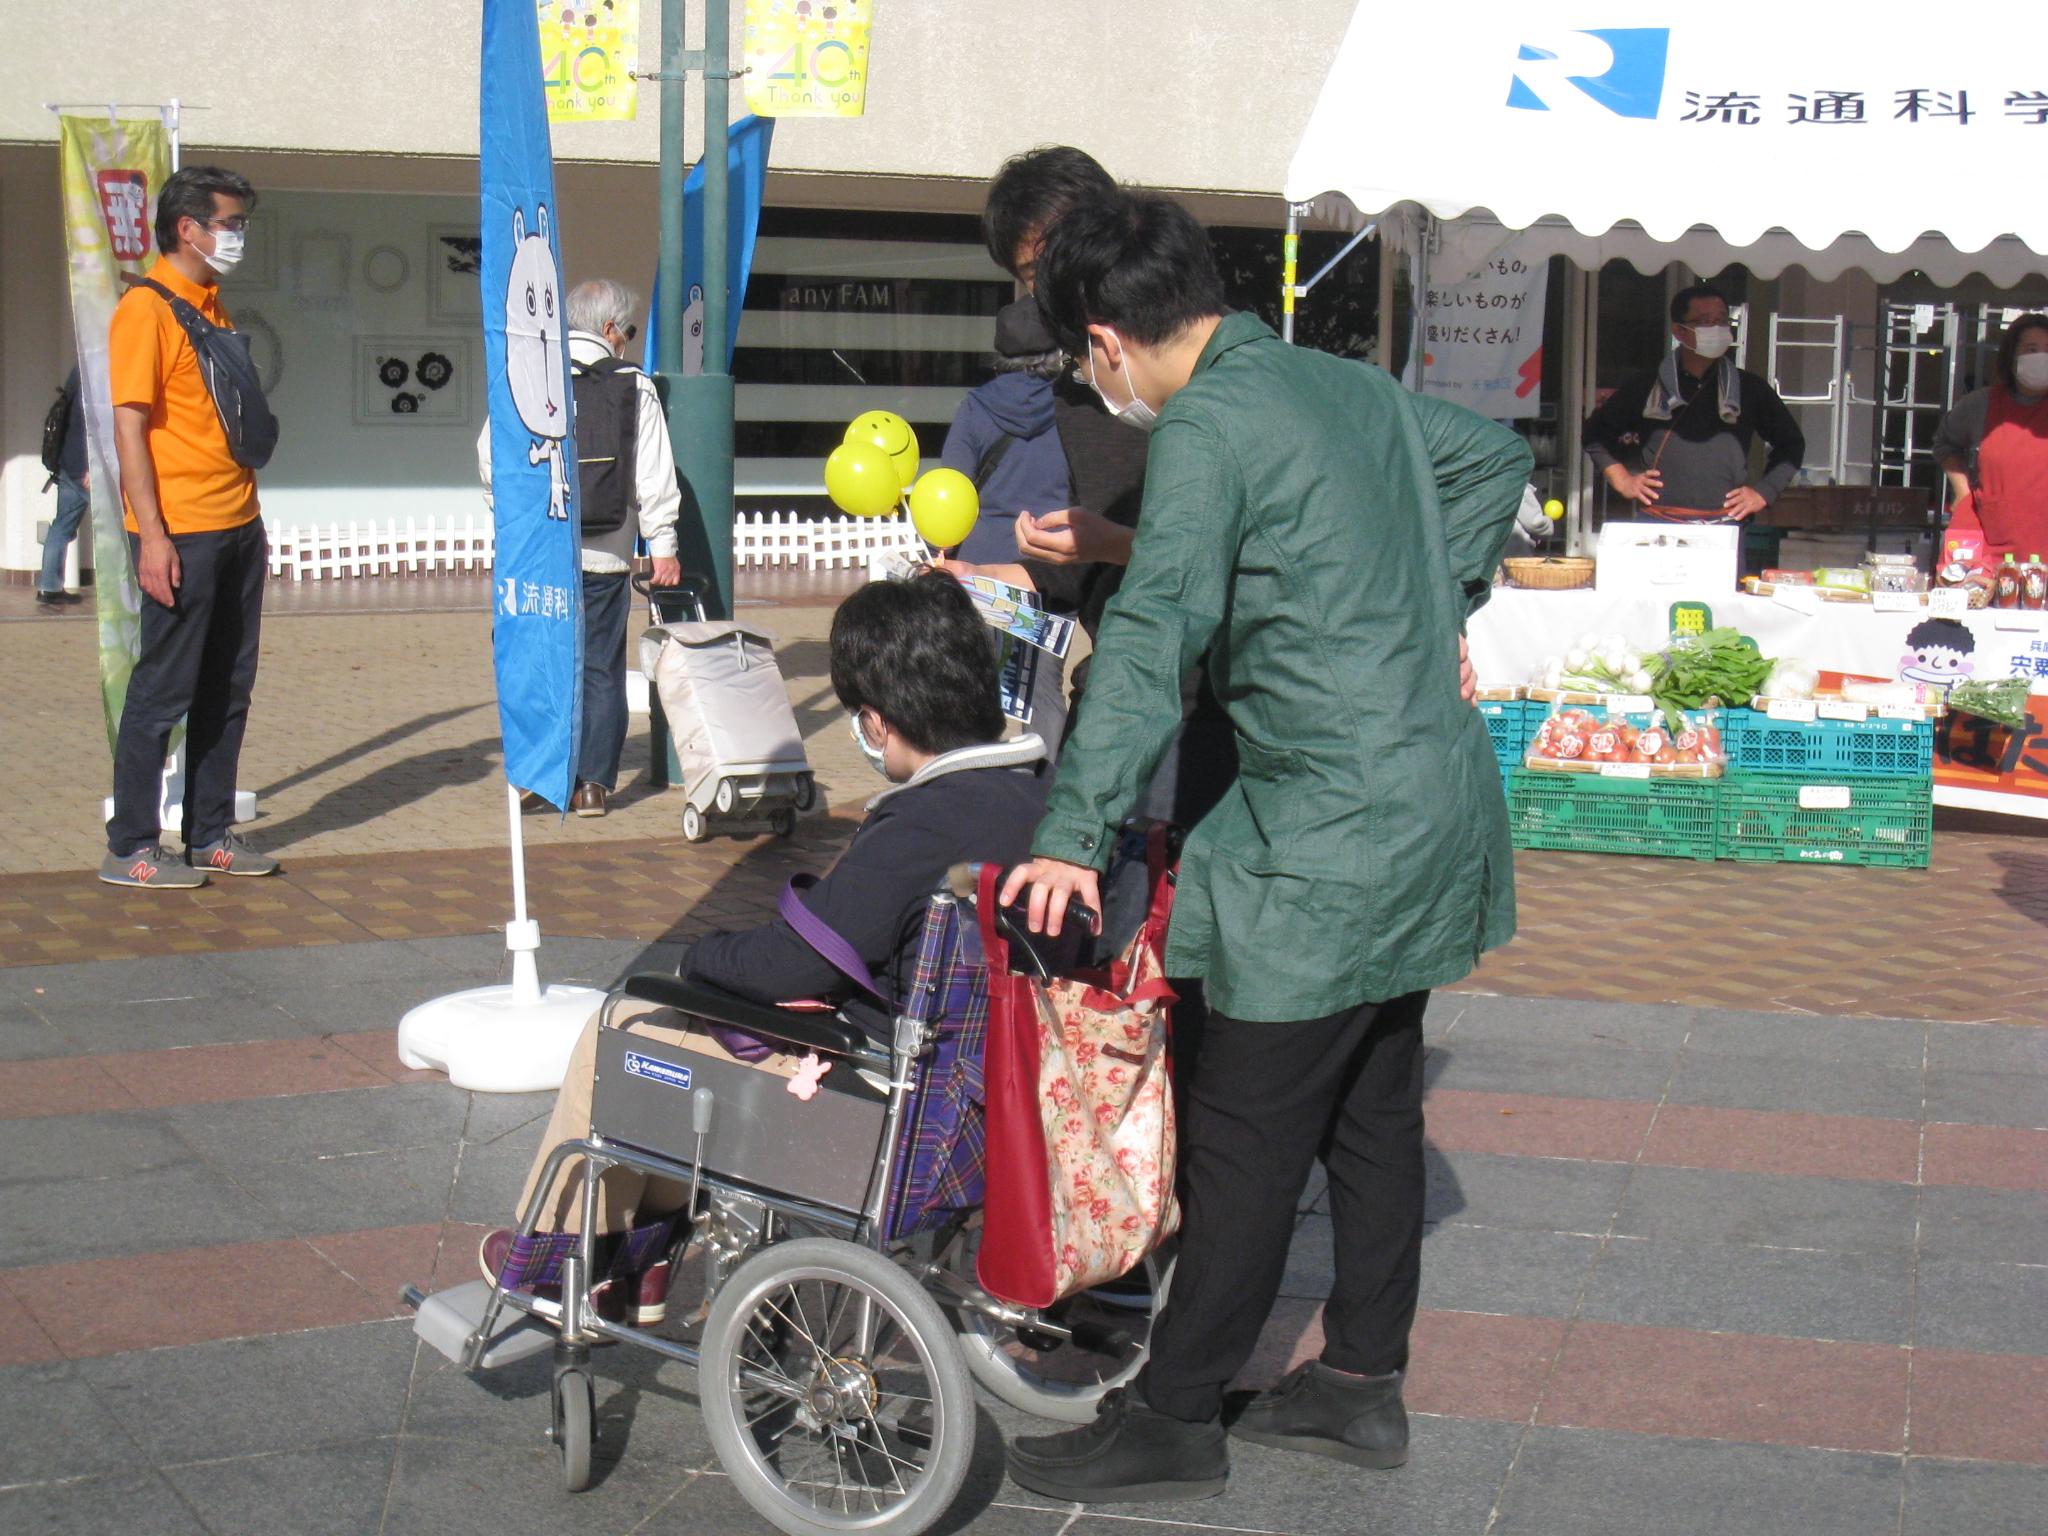 KOBE学生地域貢献スクラムと車椅子ルートマップ普及活動の連携プロジェクトがスタートしました!